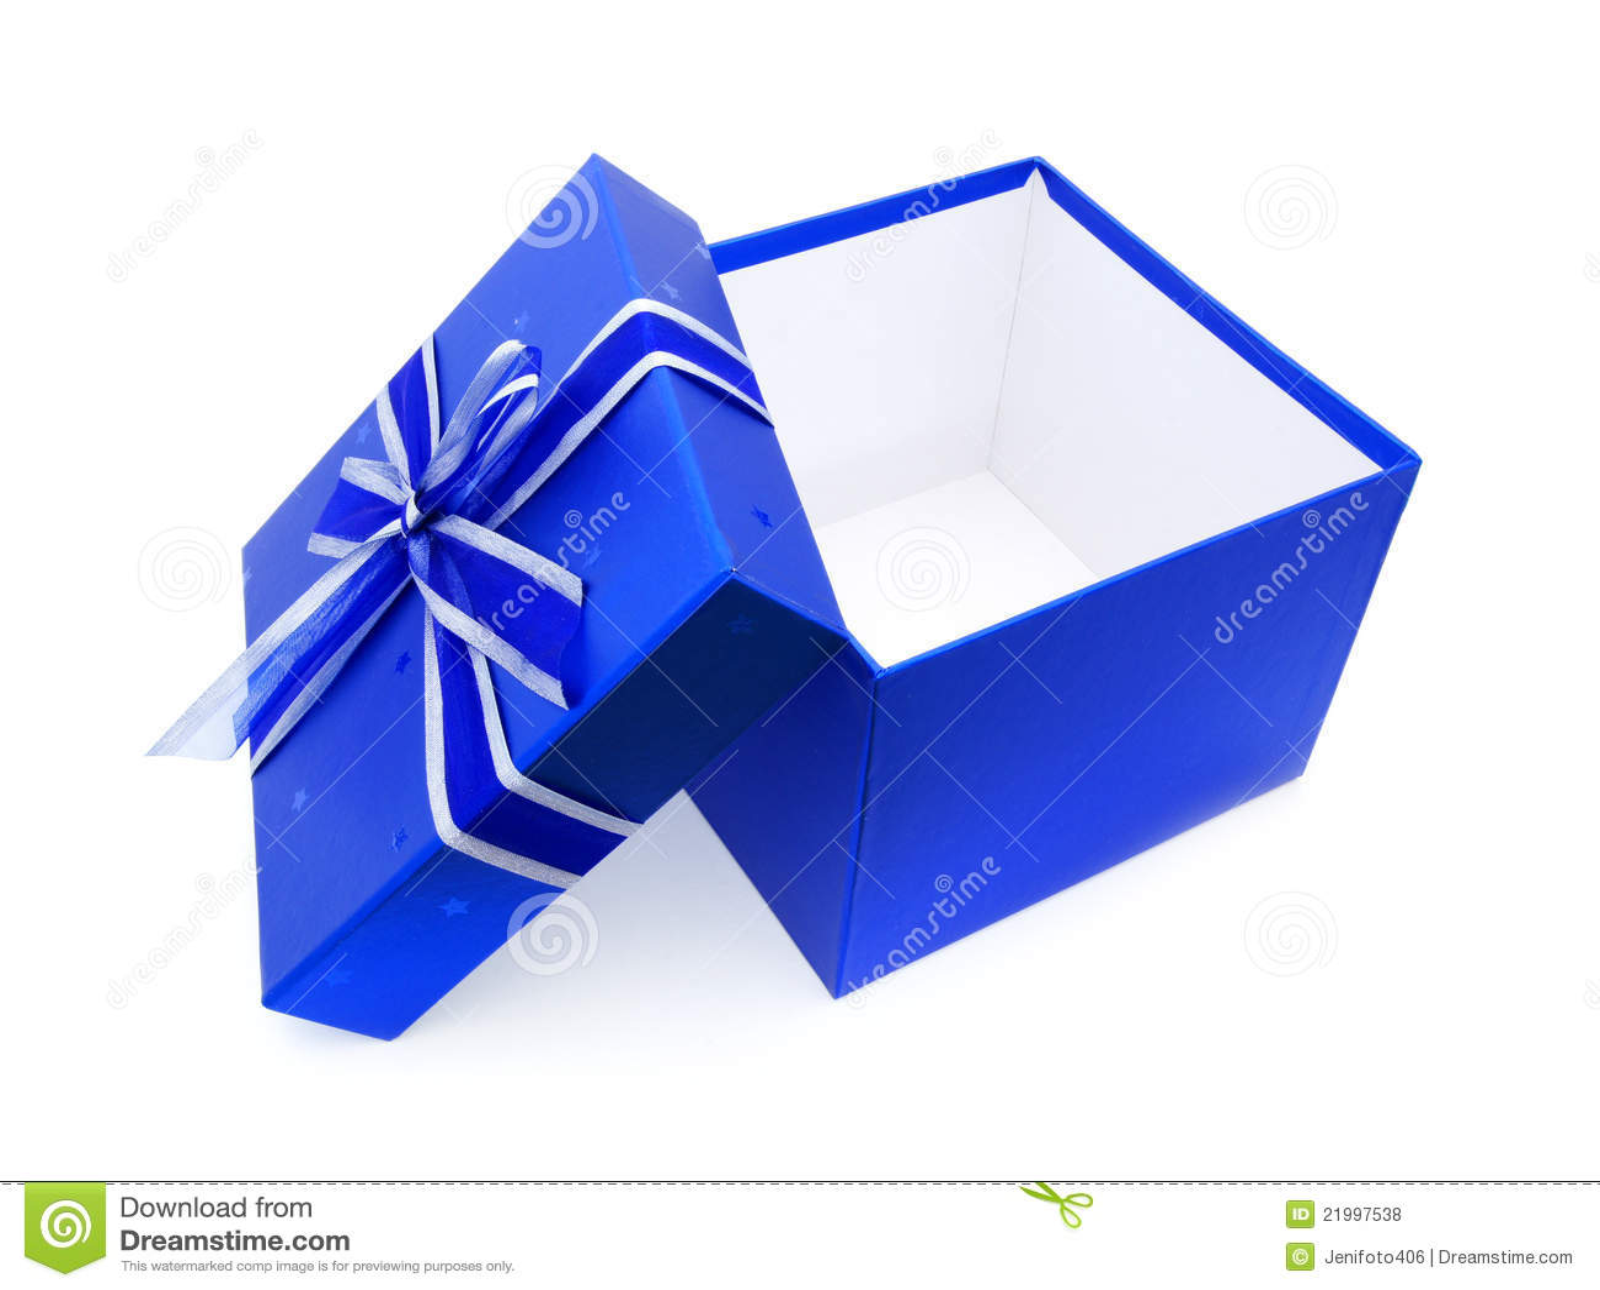 Opened Blue Gift Box Royalty Free Stock Photos - Image: 21997538